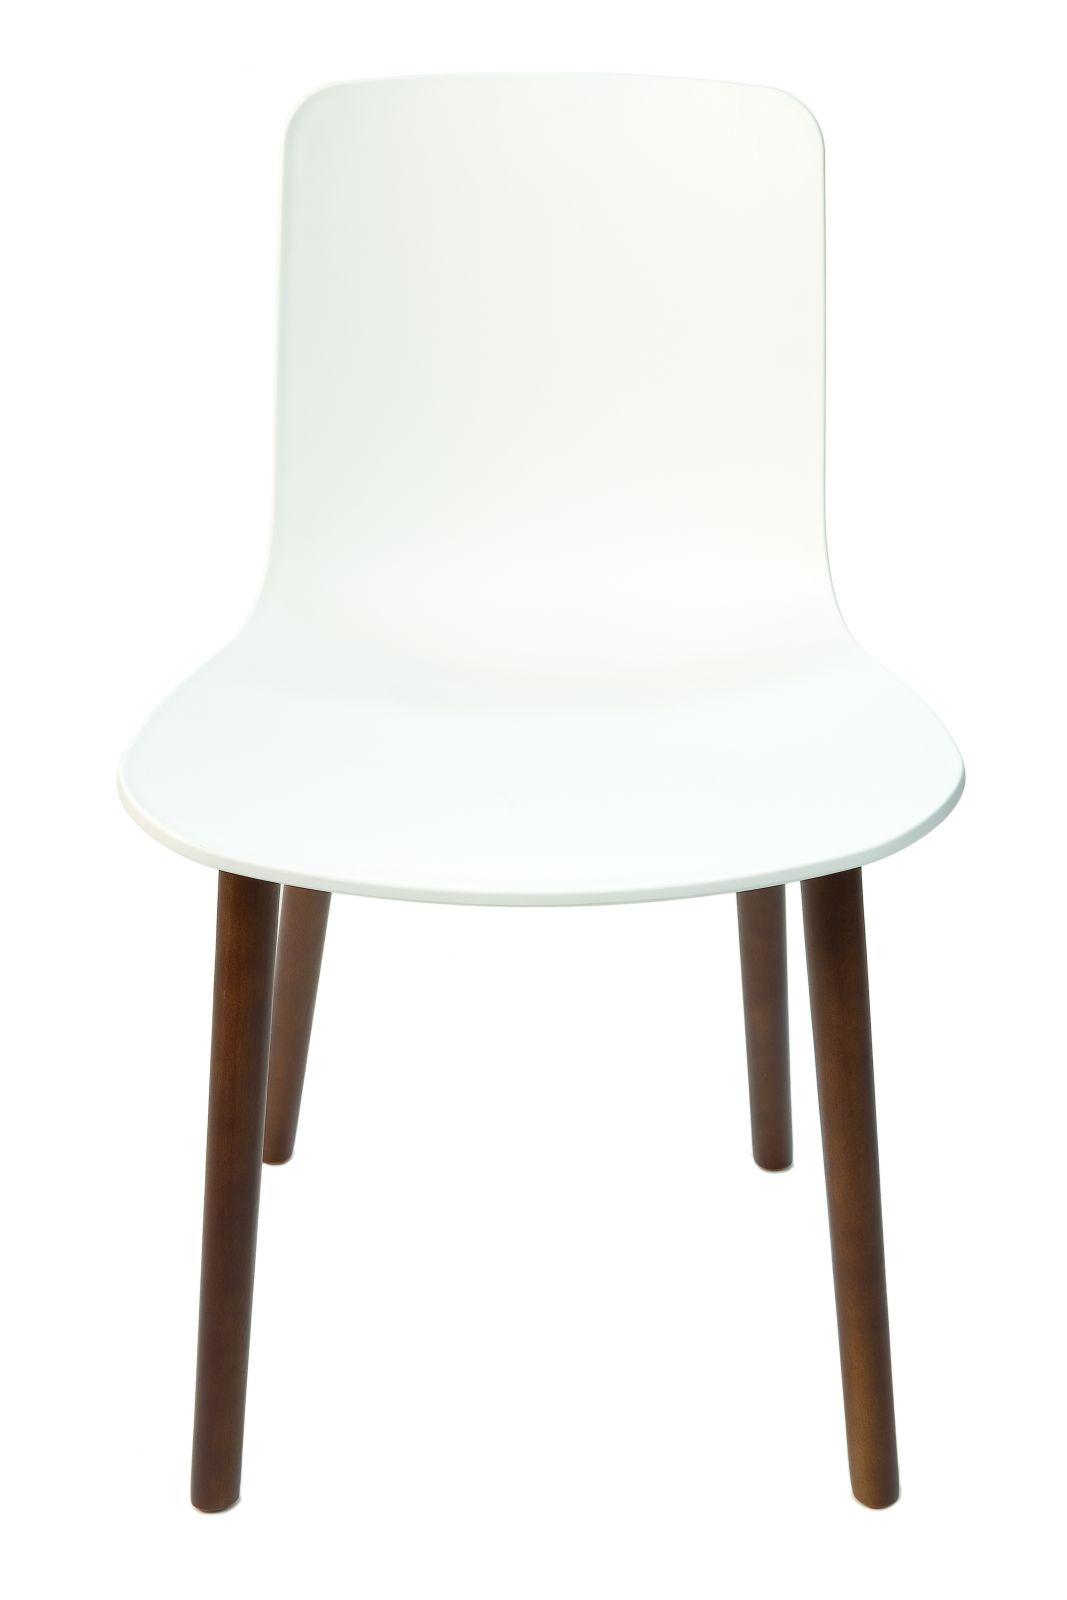 Replica Jasper Morrison Hal Chair | White Seat | Walnut Legs